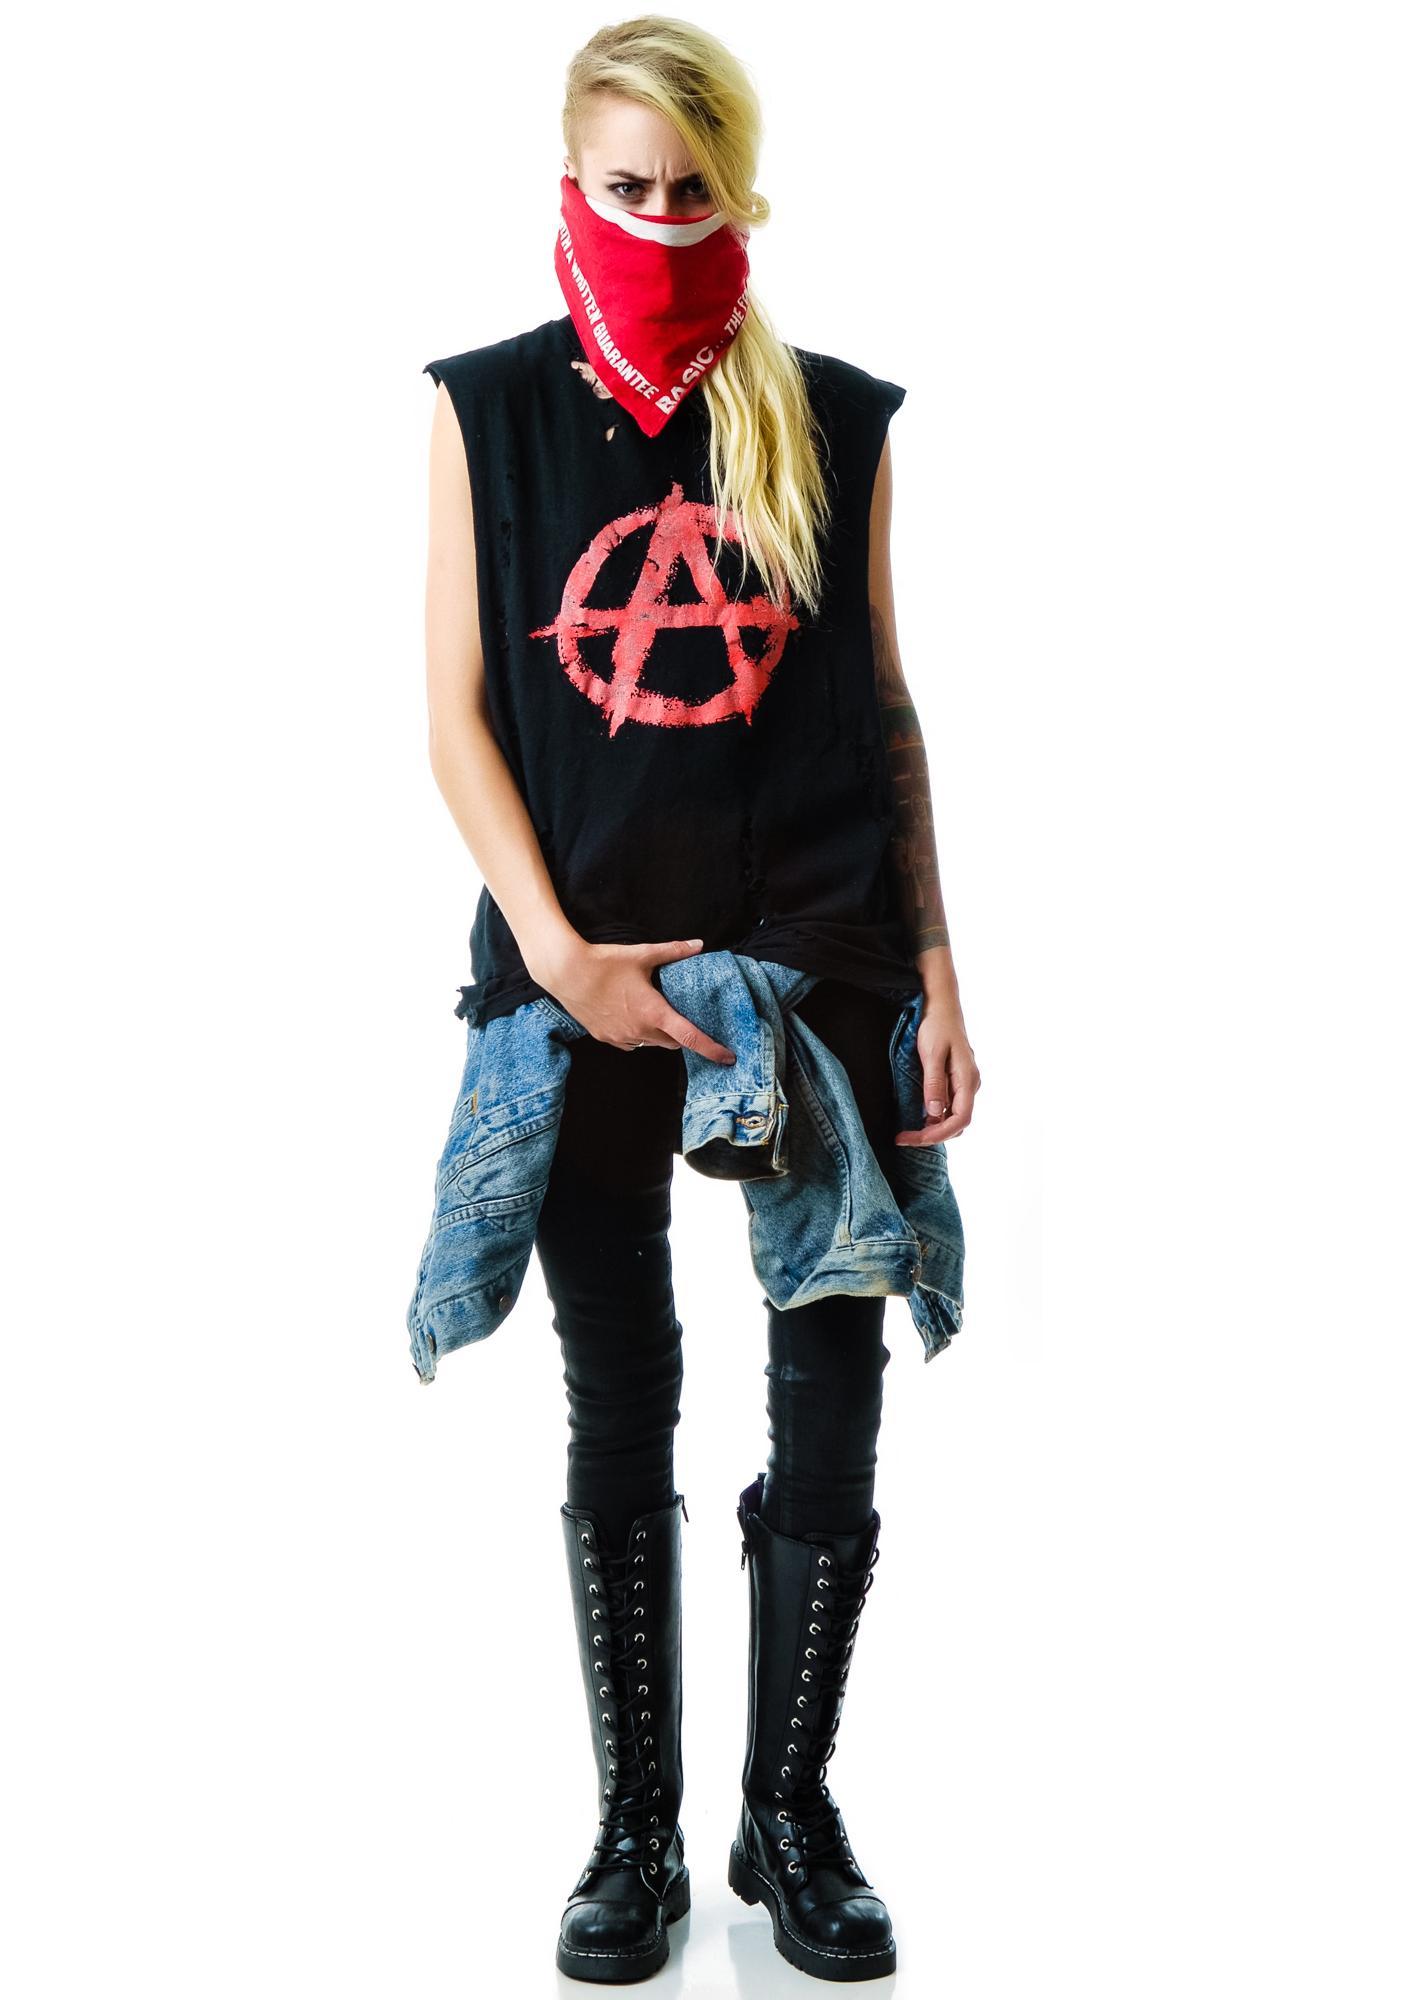 Christian Benner Anarchy Sleeveless Tee